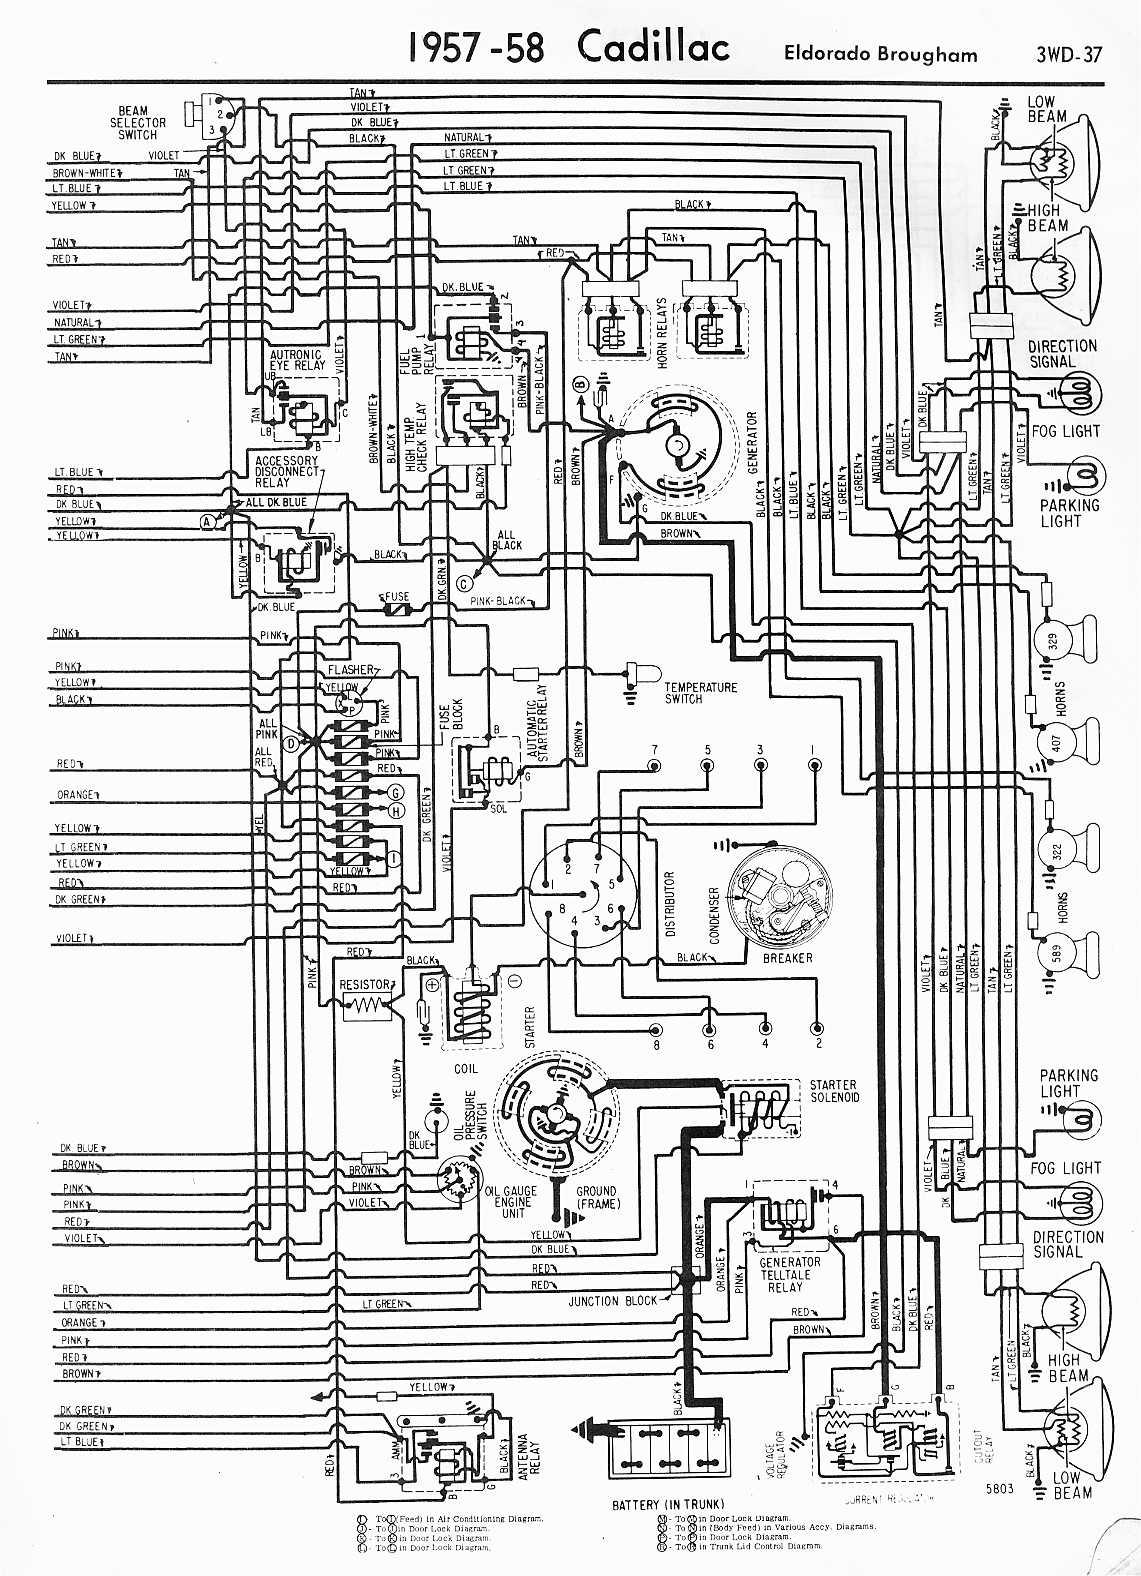 [NRIO_4796]   BM_2698] 1966 New Yorker Wiring Diagram Free Diagram | 1966 Chrysler Newport Wiring Diagram |  | Arch Aspi Anist Ricis Lious Elec Mohammedshrine Librar Wiring 101